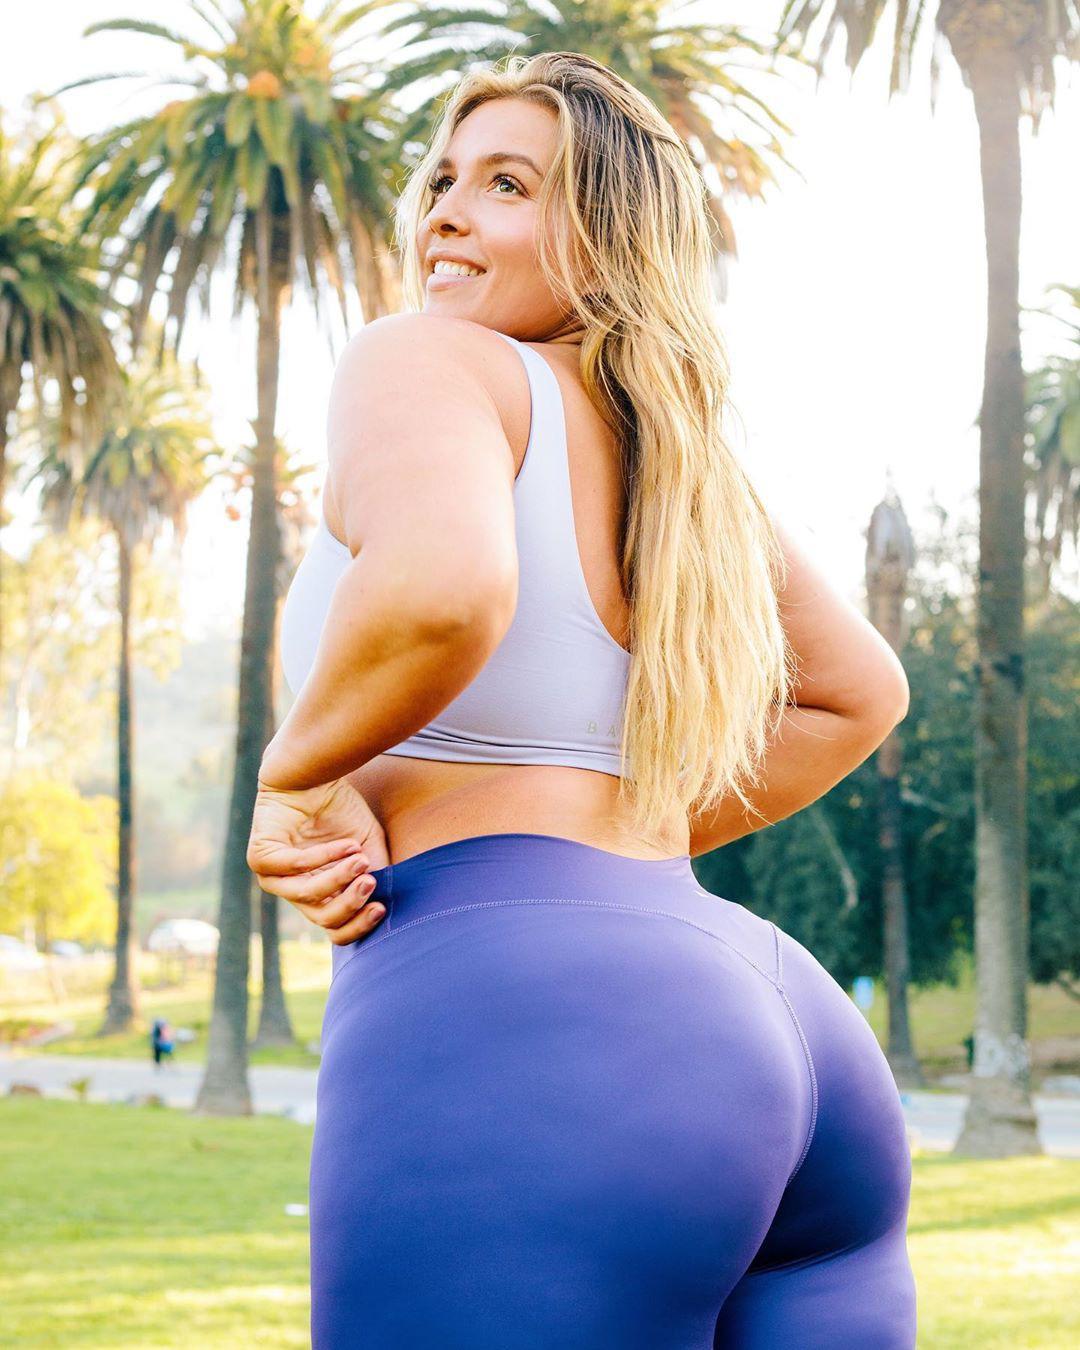 Stephanie Viada Instagram sensation active pants, sportswear colour outfit ideas 2020